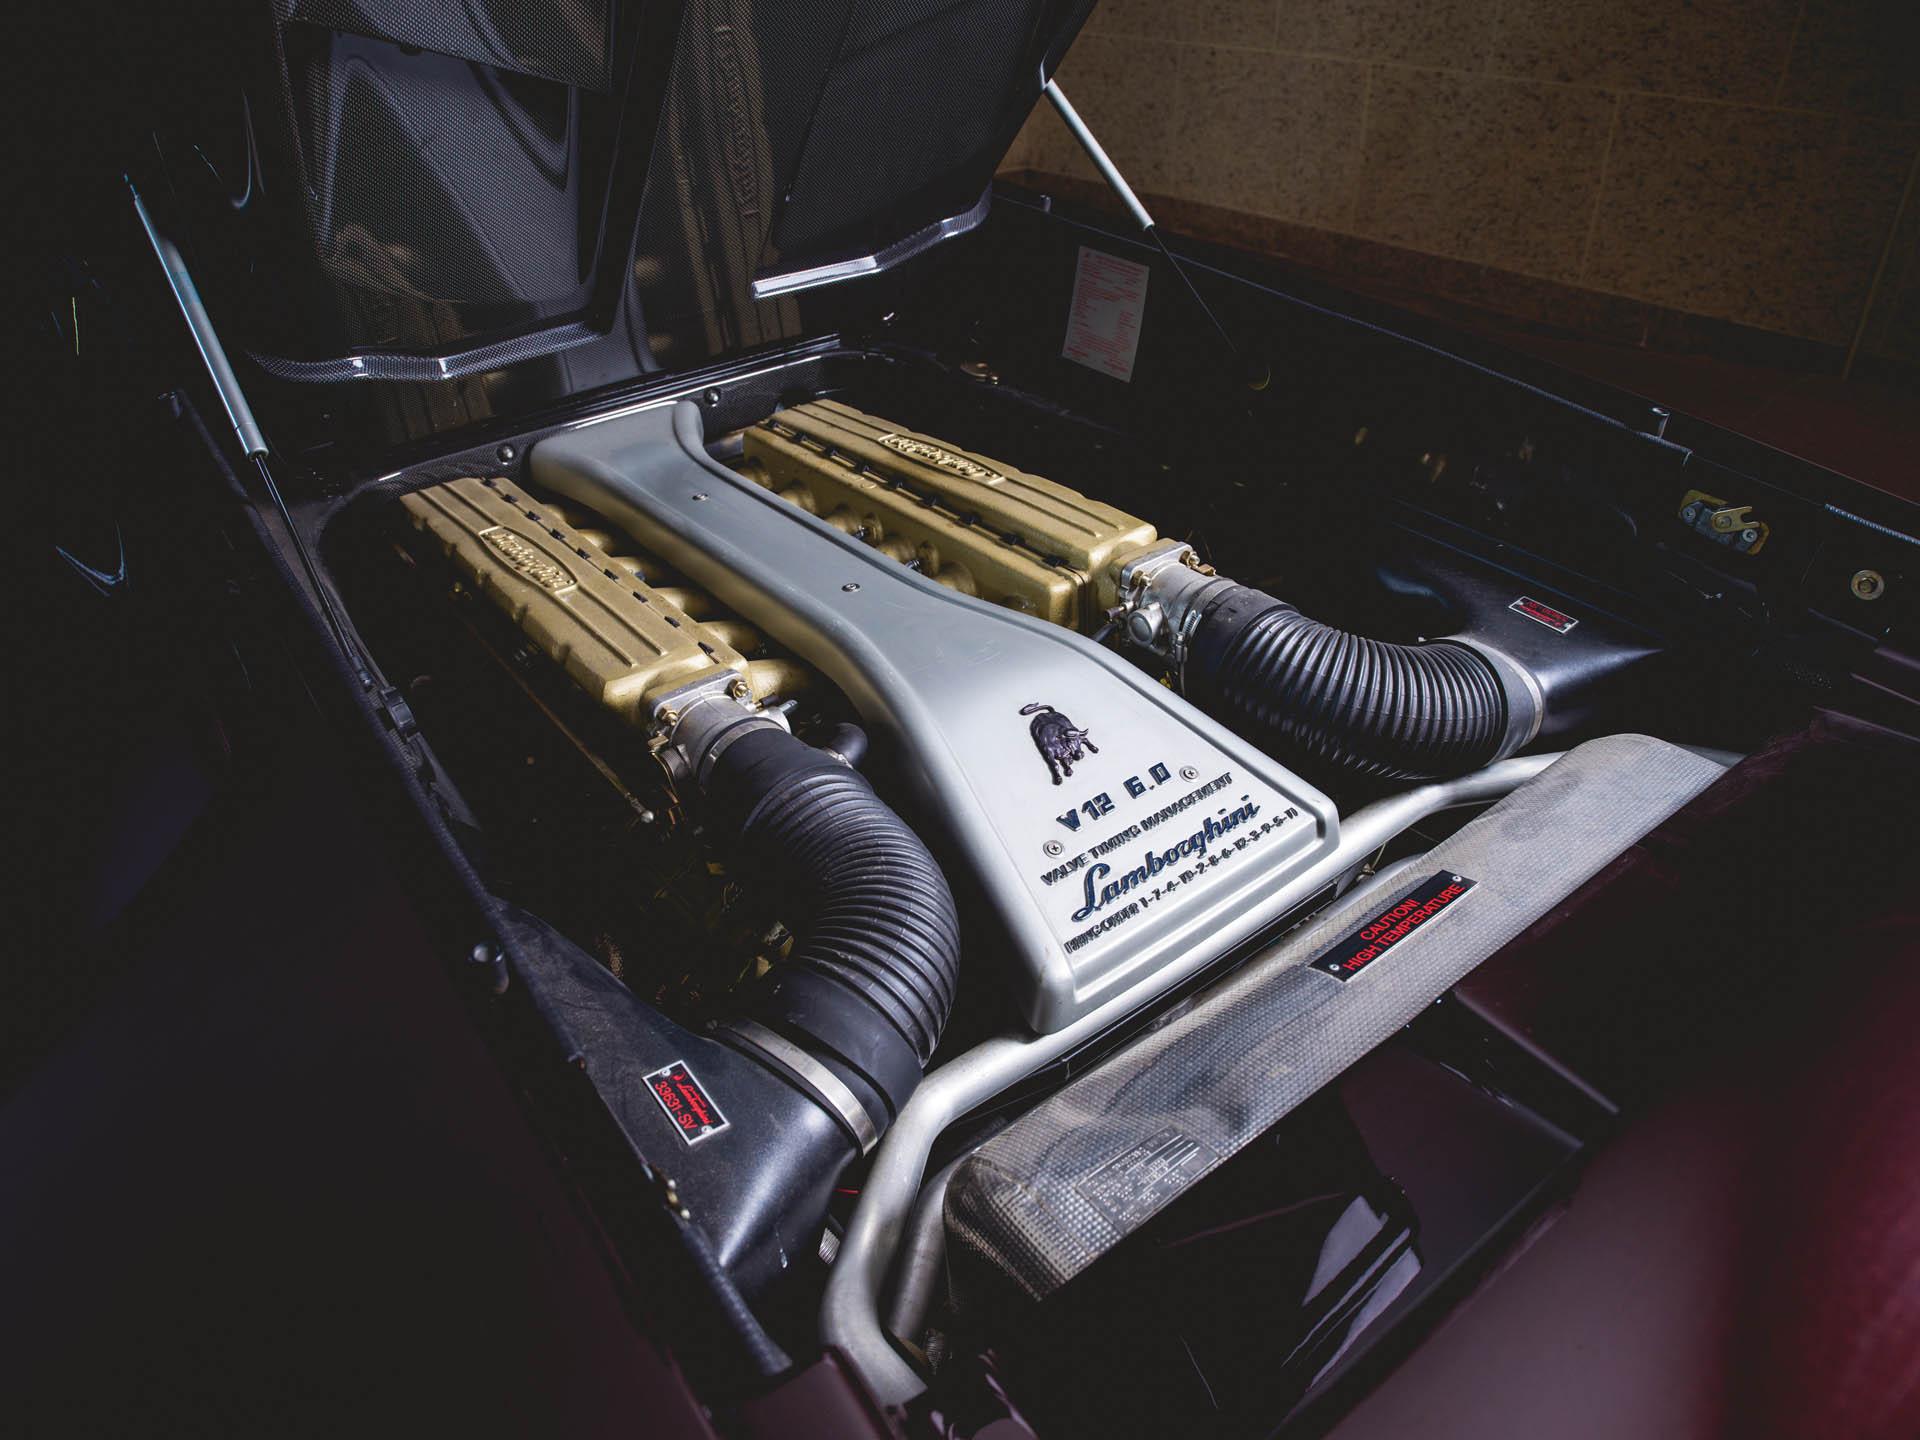 Lamborghini Diablo VT 6.0 SE for sale (3)